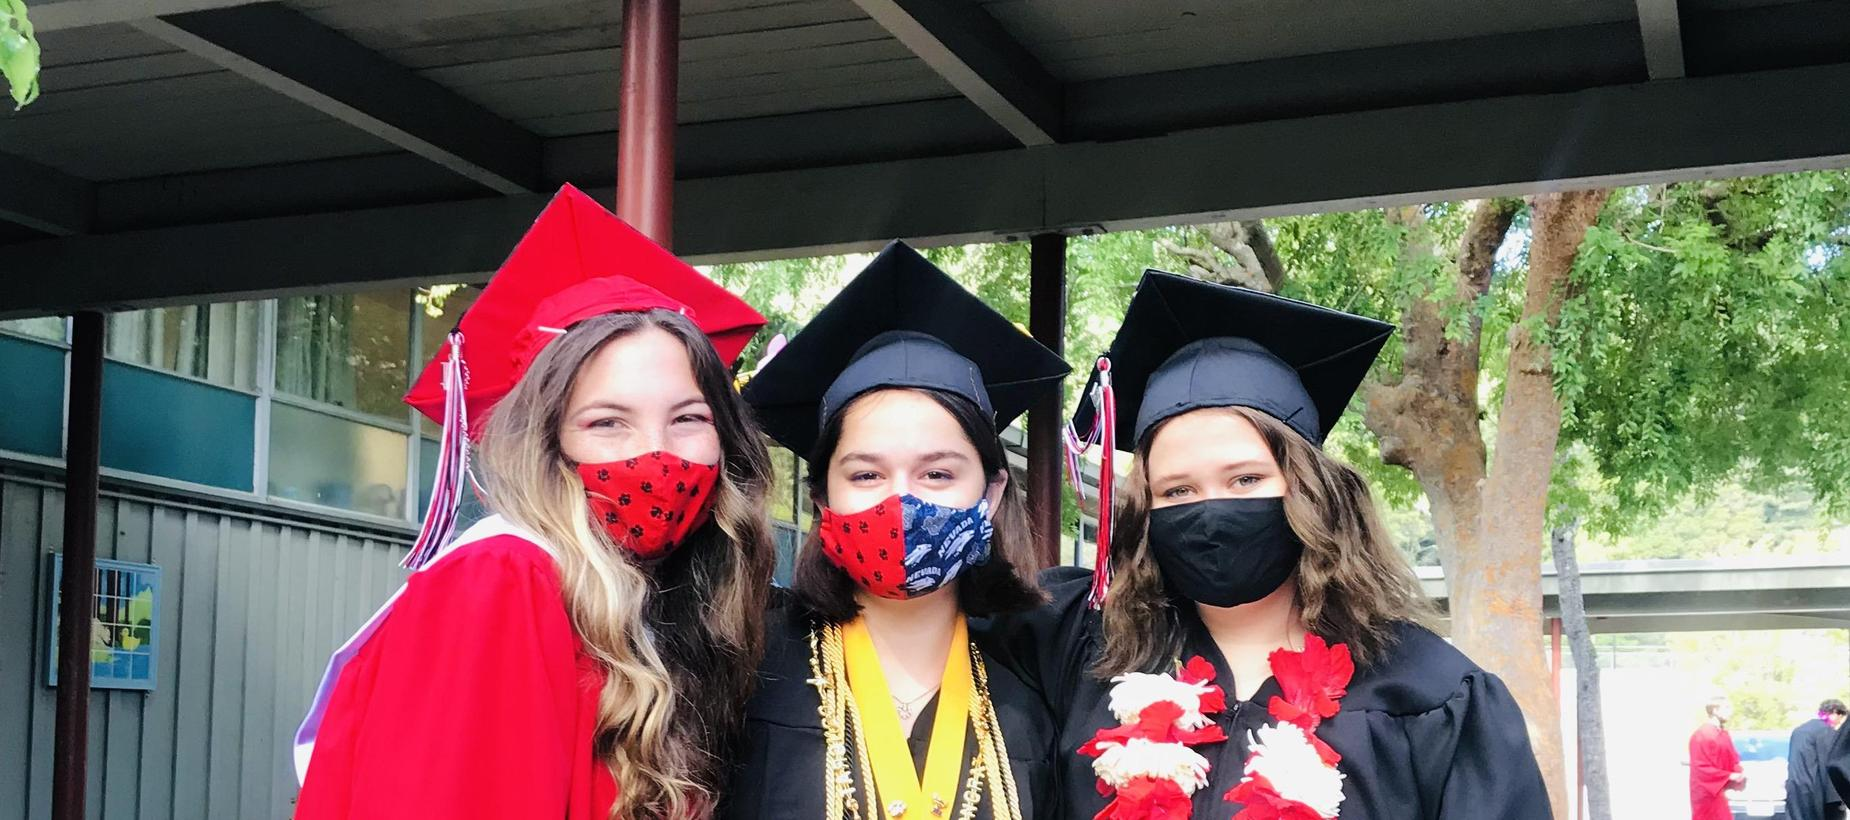 2021 Graduates - 3 girls